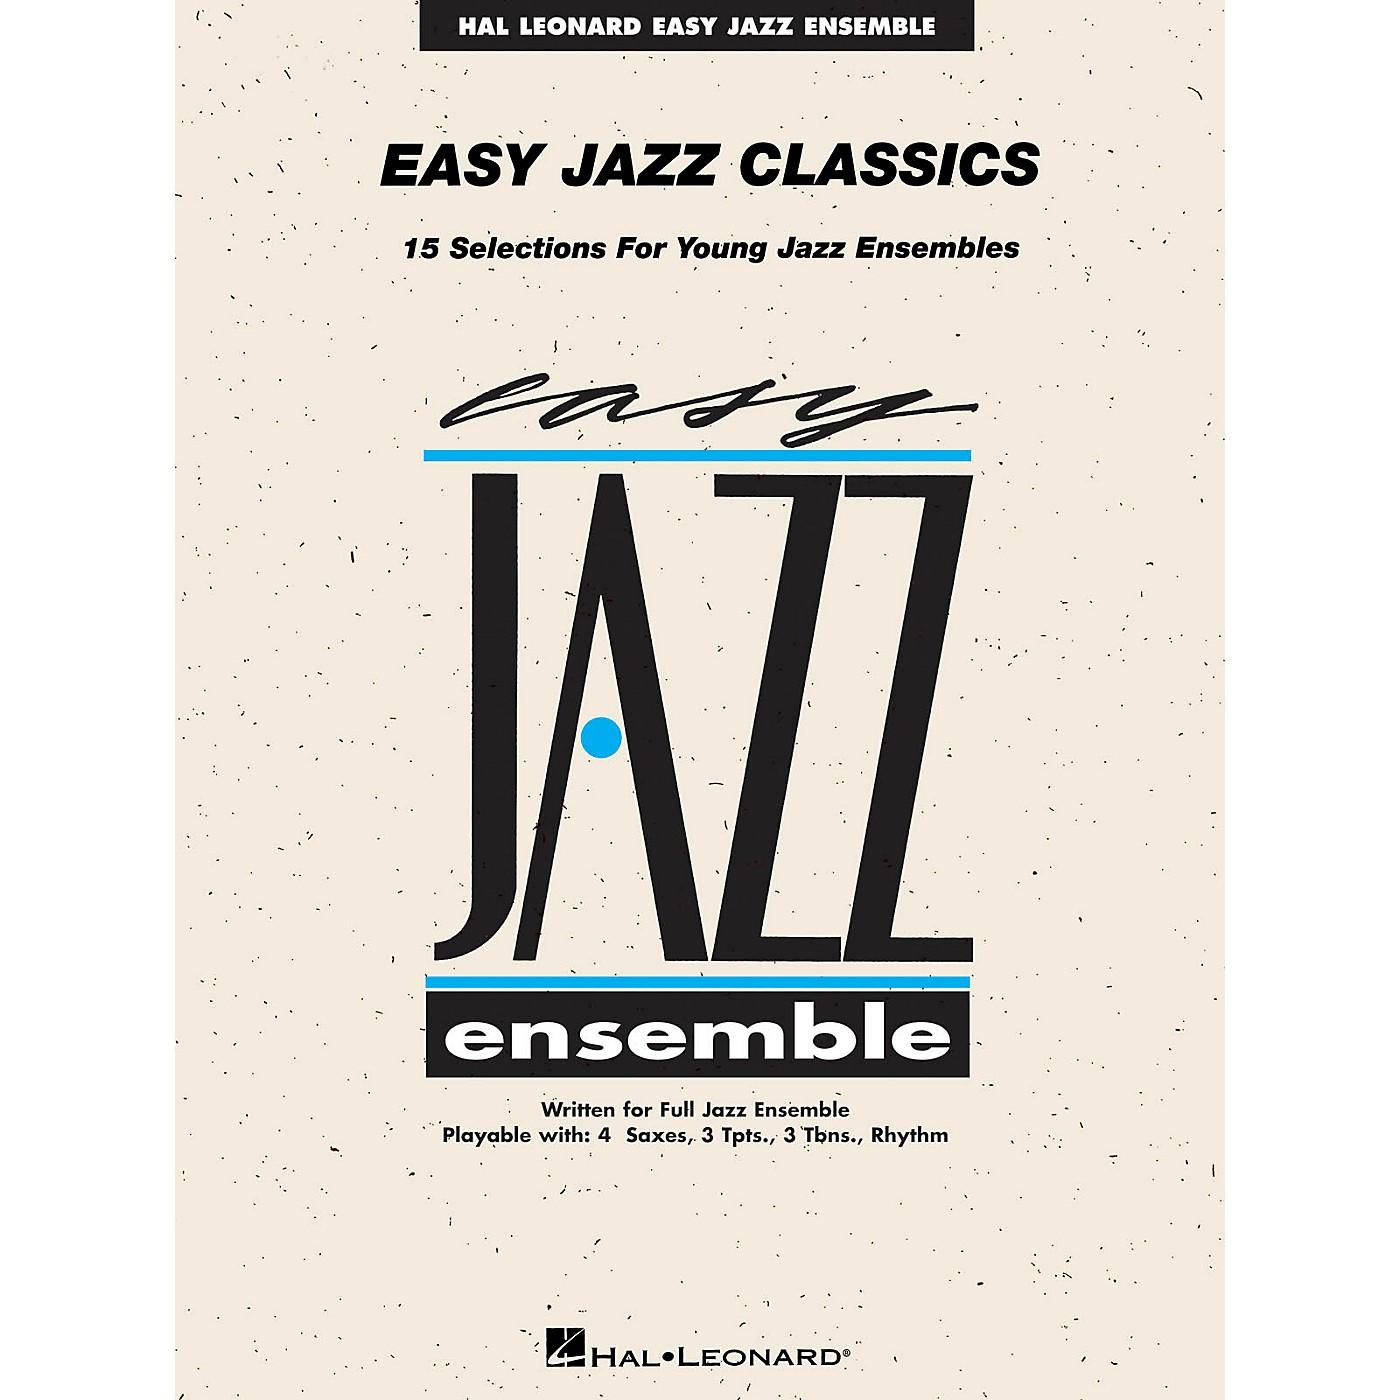 Hal Leonard Easy Jazz Classics - Trumpet 2 Jazz Band Level 2 thumbnail